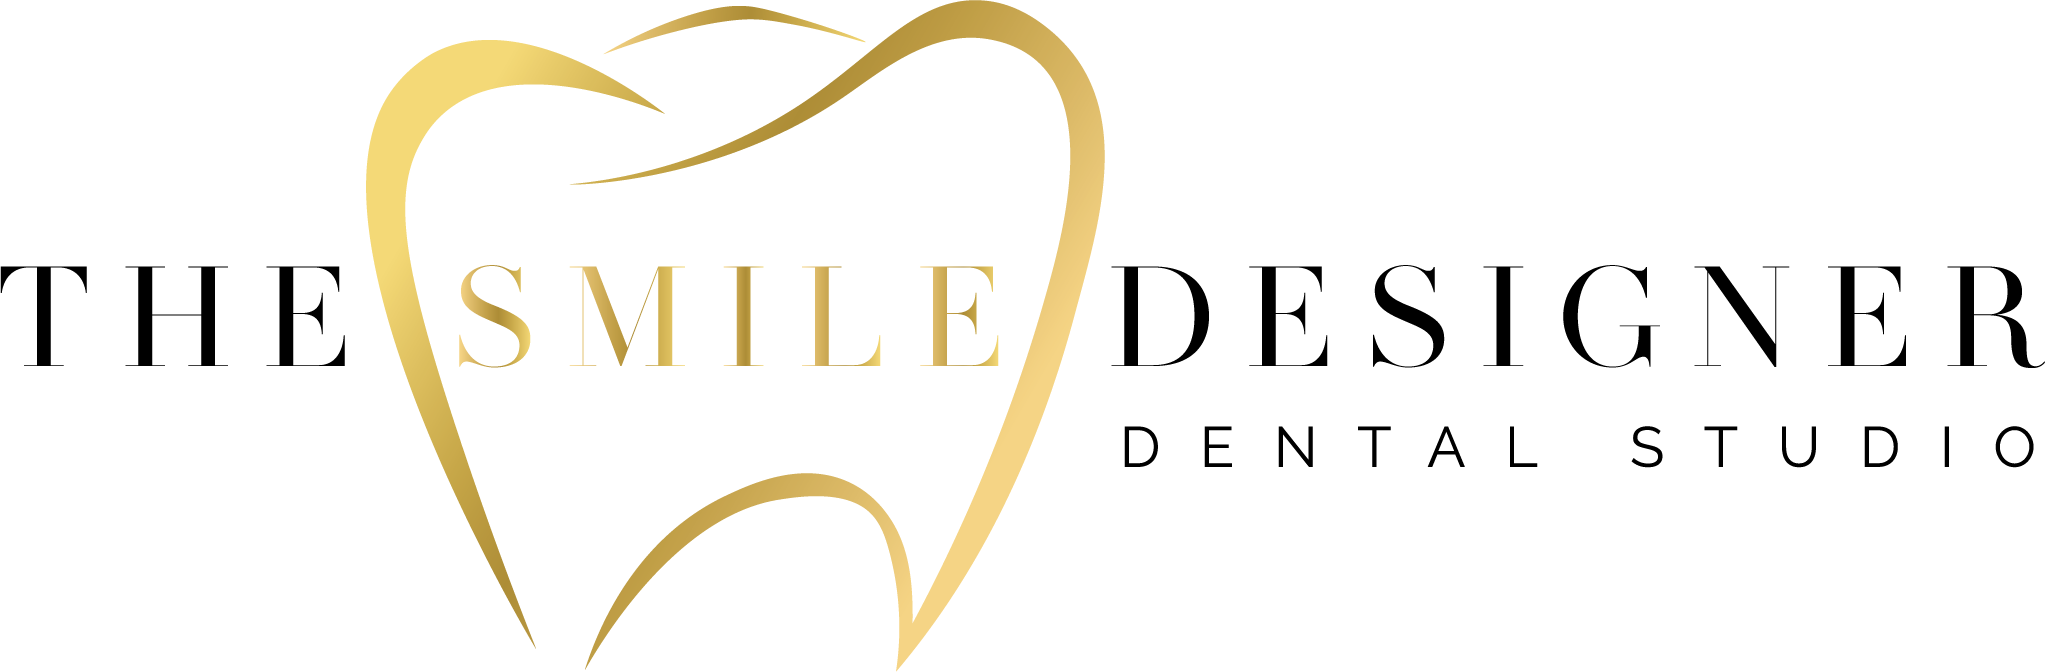 official business logo of The Smile Designer Dental Studio